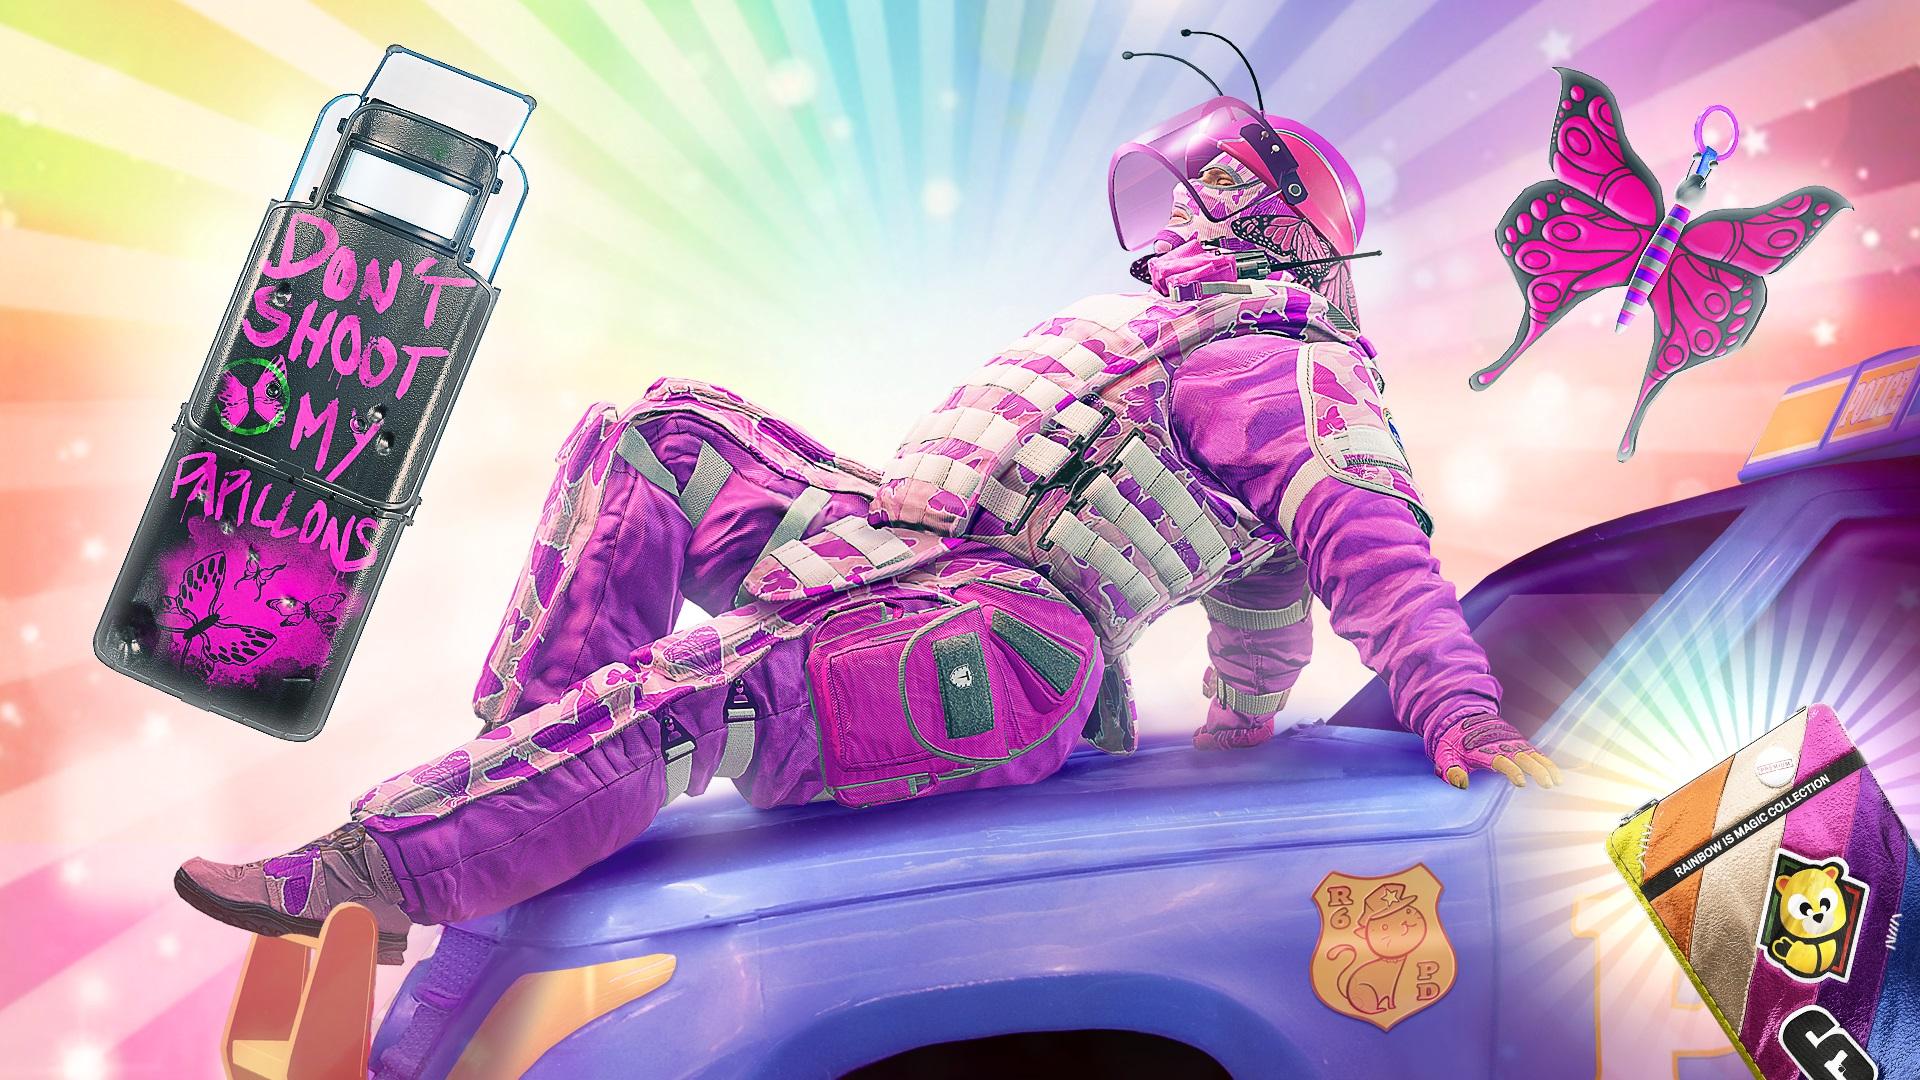 Rainbow Six Siege April Fools' Day Event Adds Unicorns, Pink